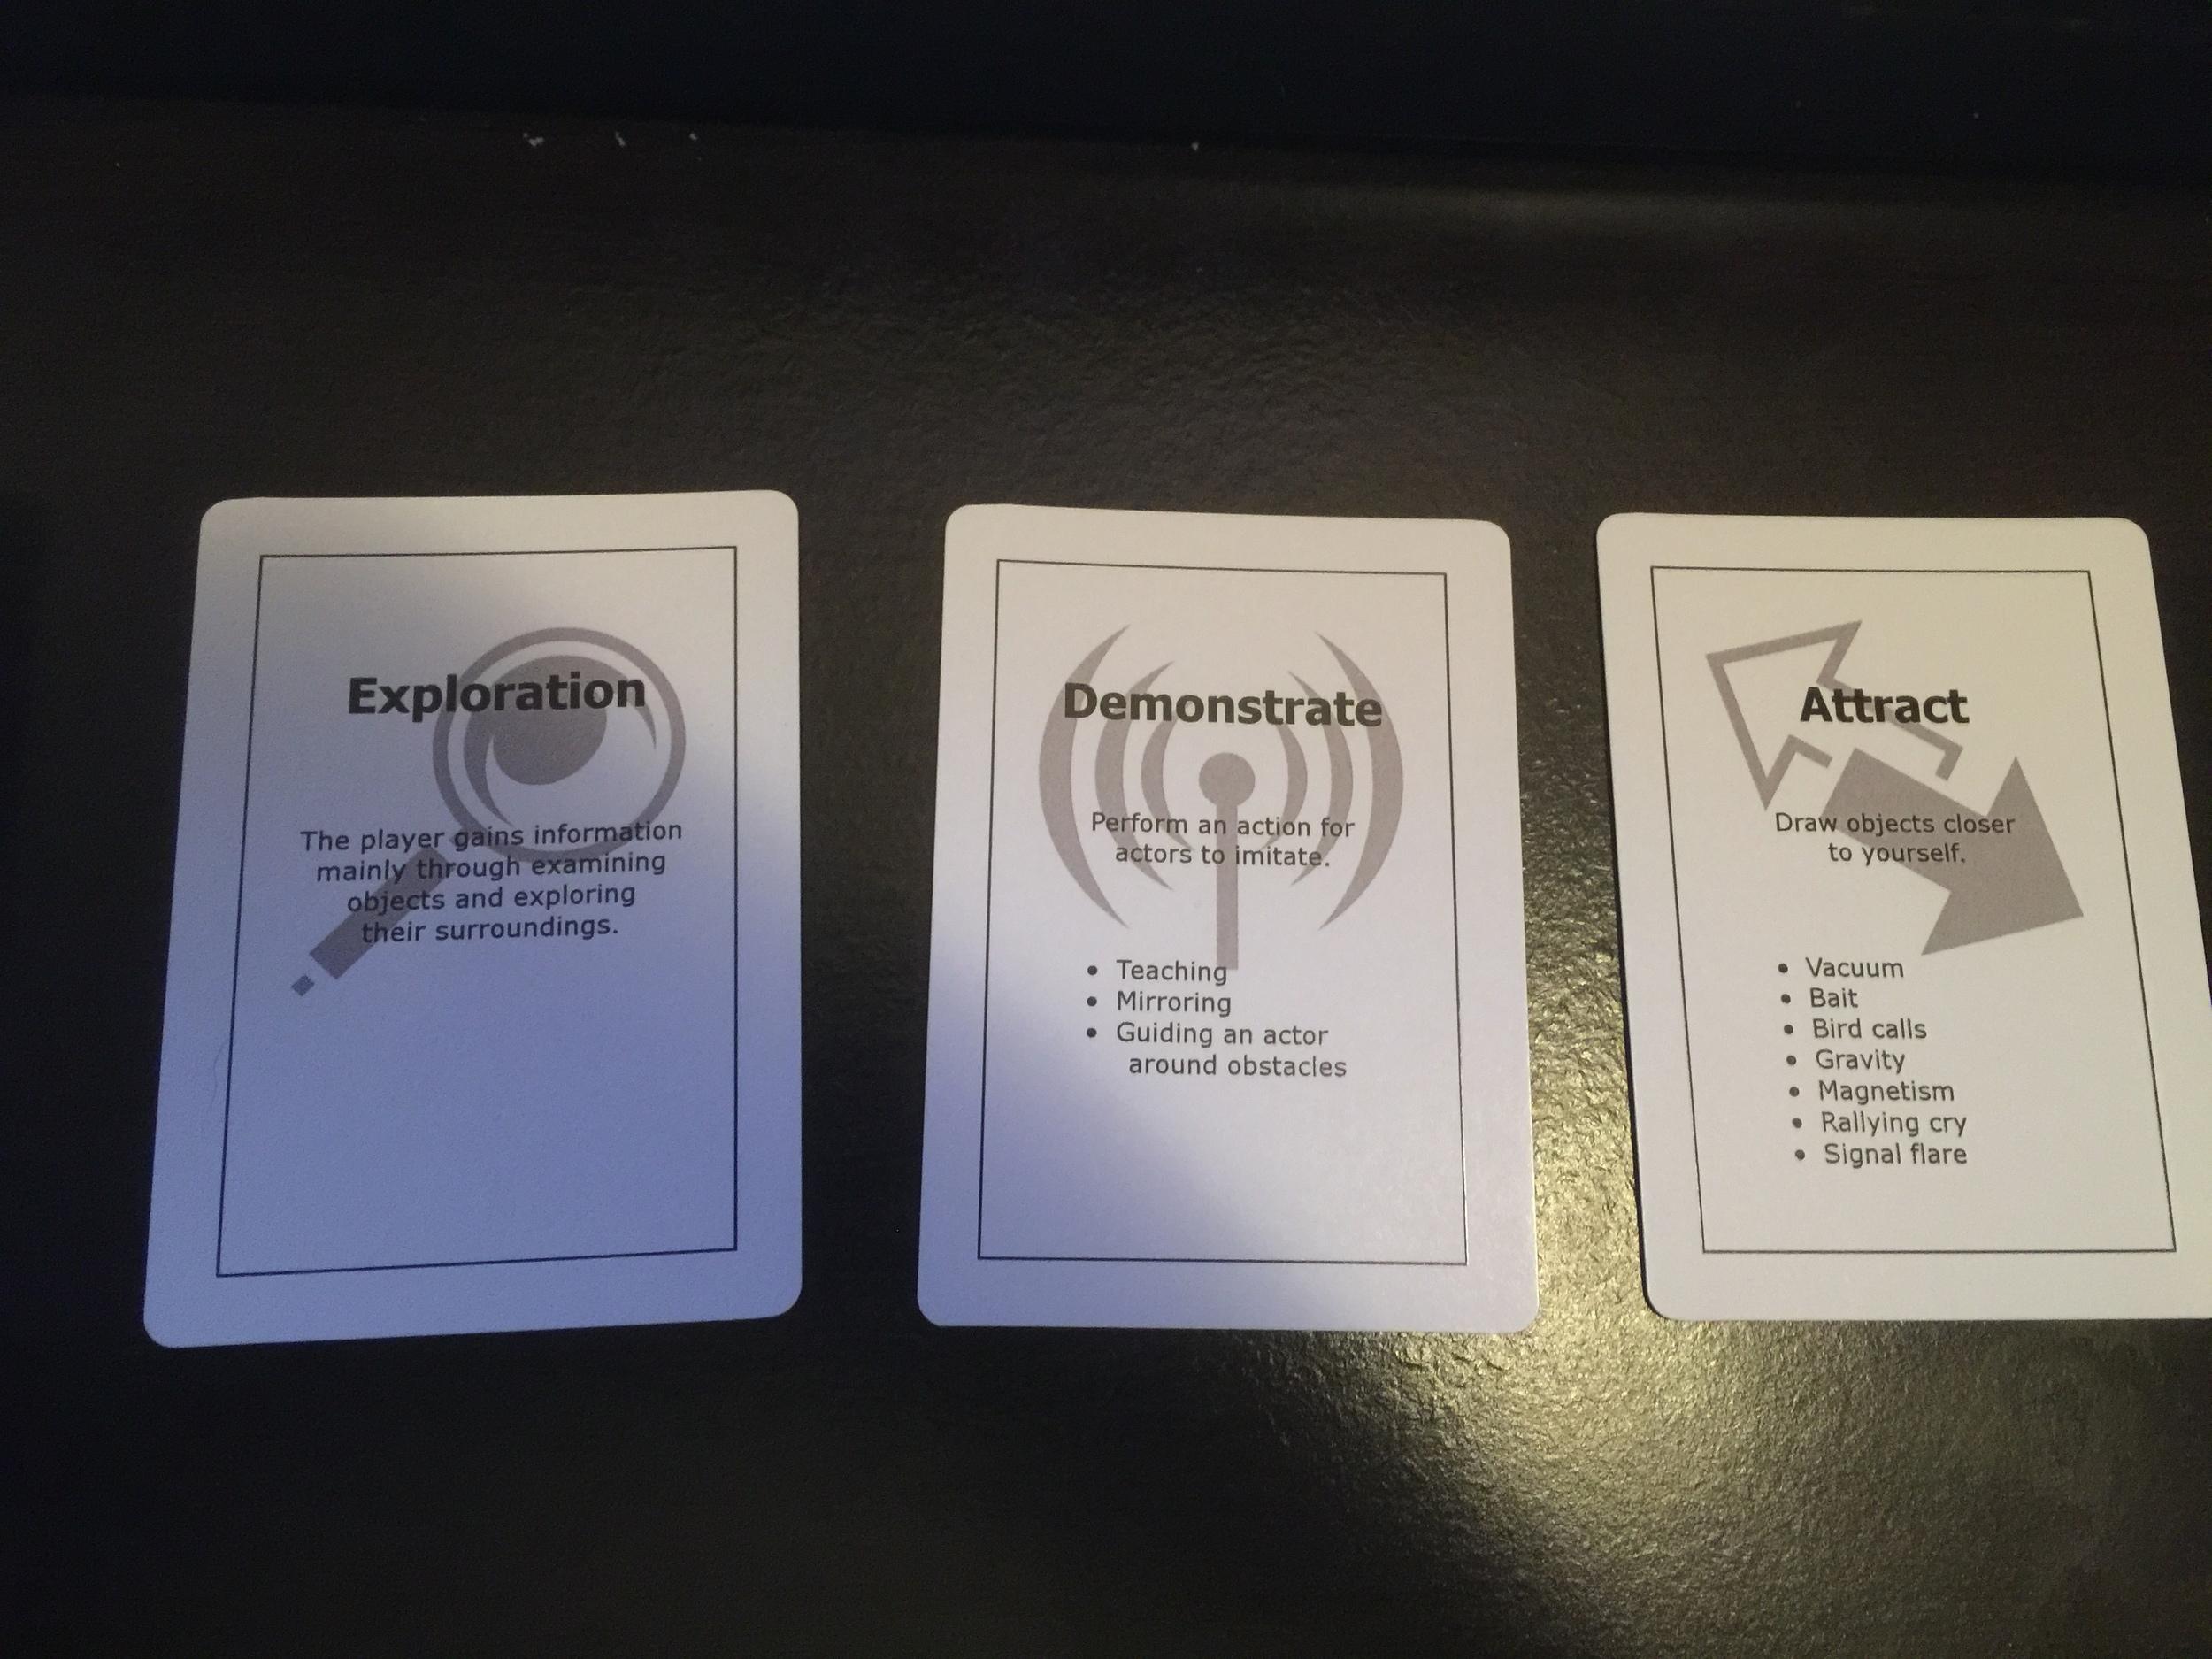 GameStorming Podcast Episode 6 Brainstorming Cards